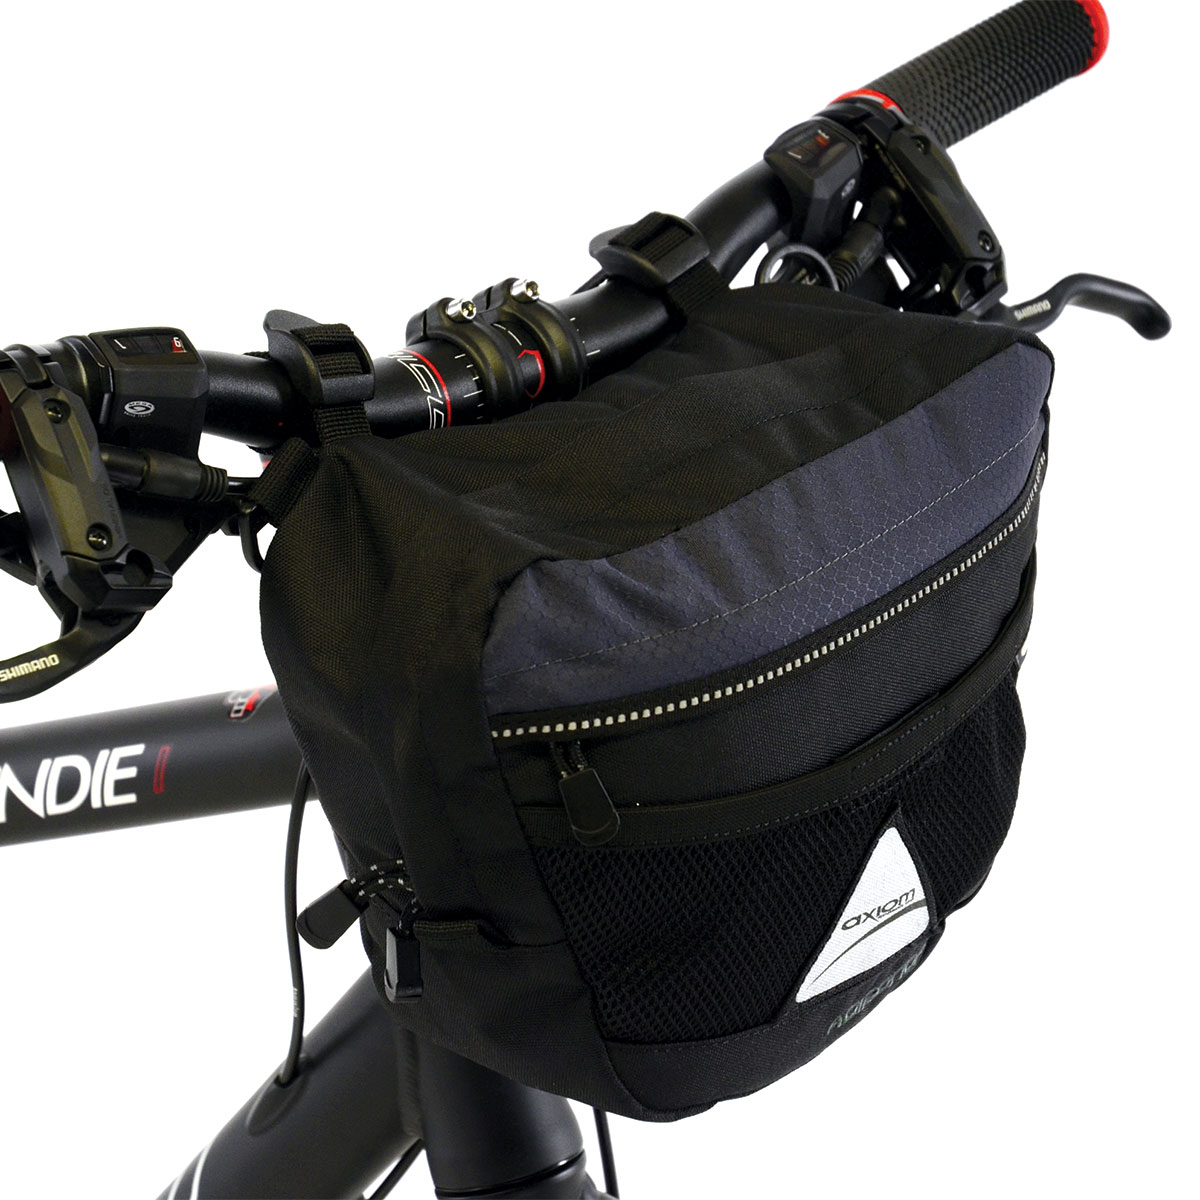 Axiom Adirondack 4 5 Handlebar Bag